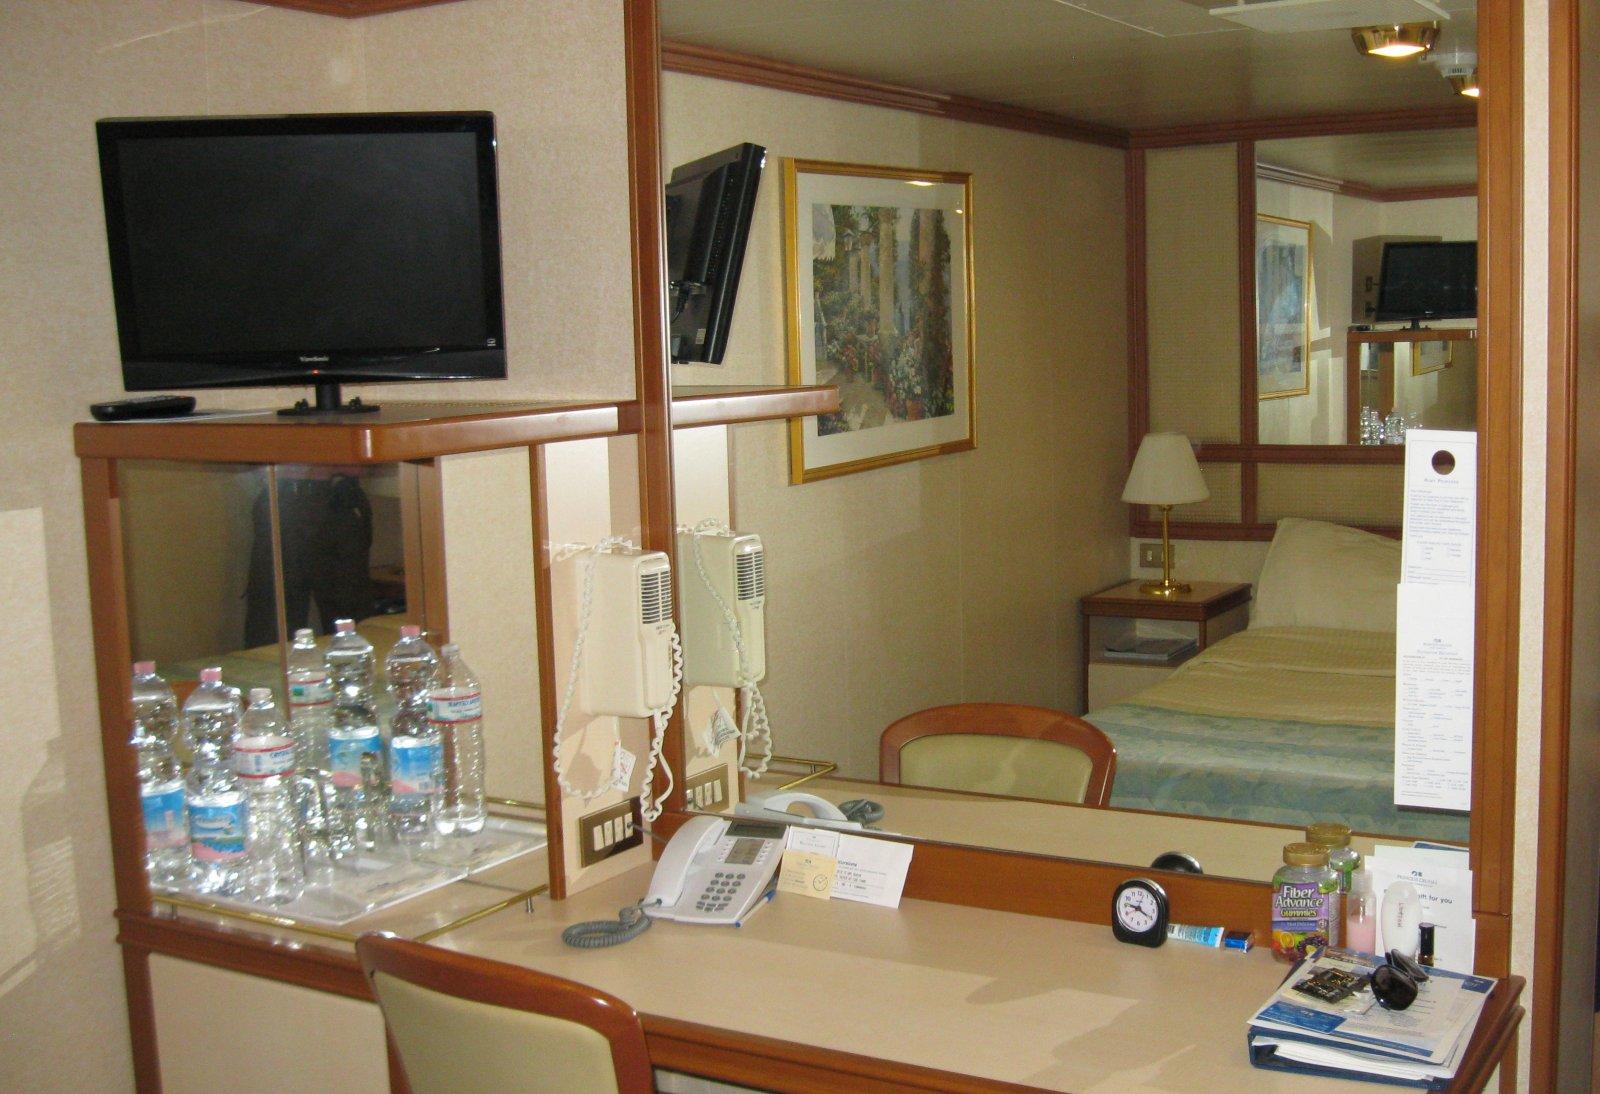 Click image for larger version  Name:2012 Princess Cruise 844crop.jpg Views:44 Size:264.3 KB ID:159260